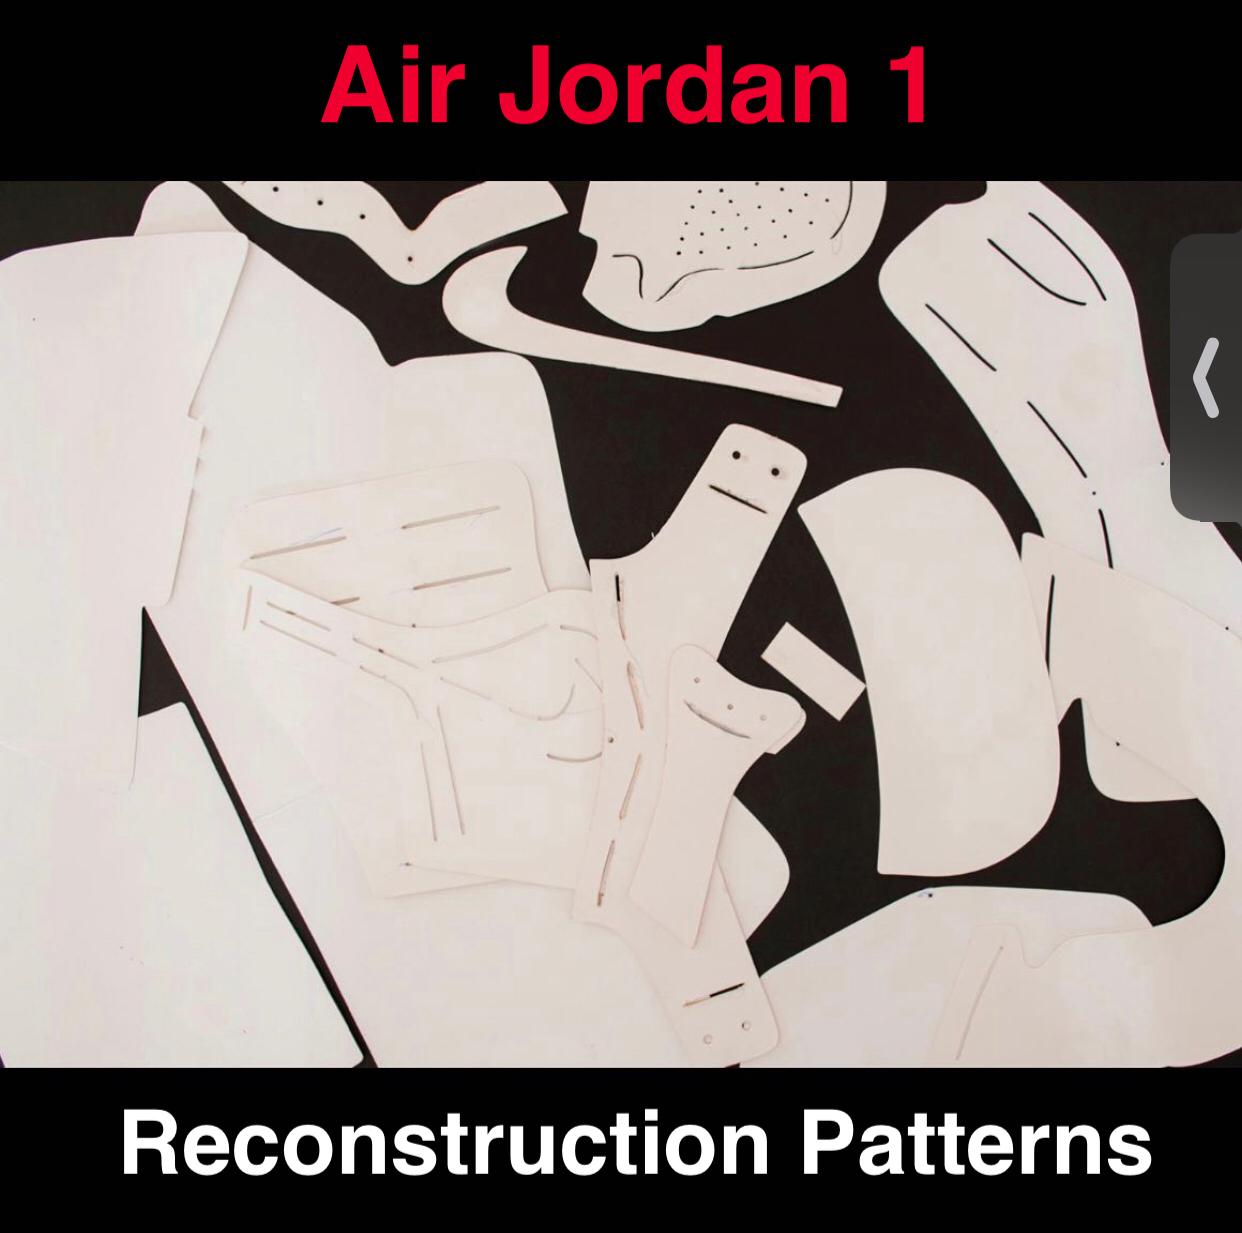 Jordan 1 Paper Patterns to Reconstruct Shoes